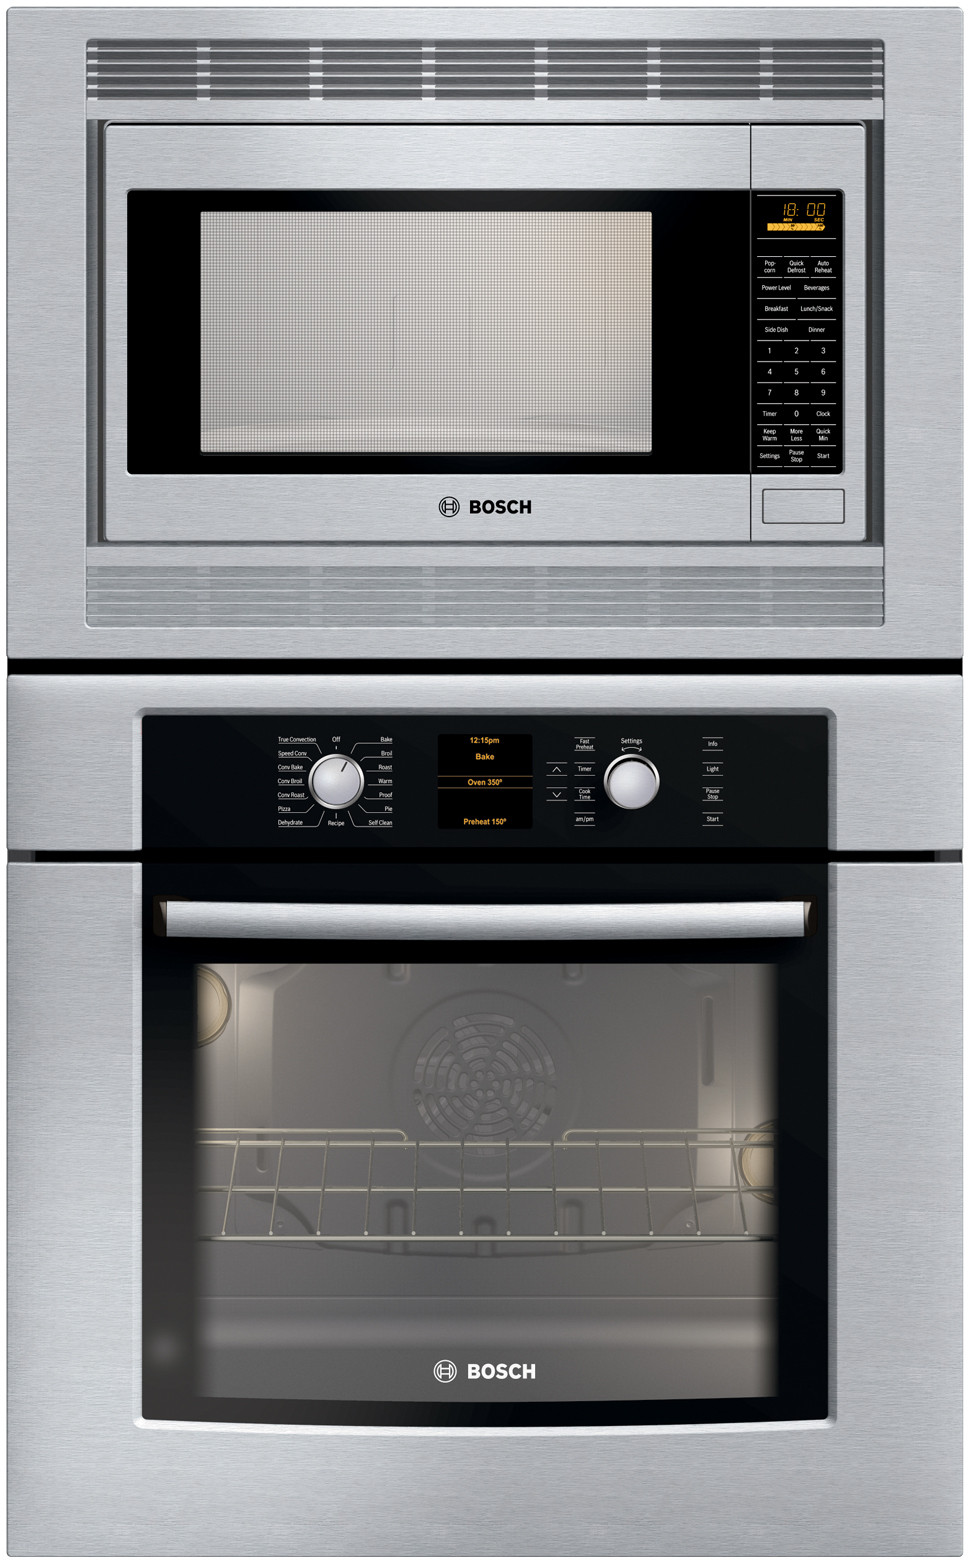 granica bosch microwave